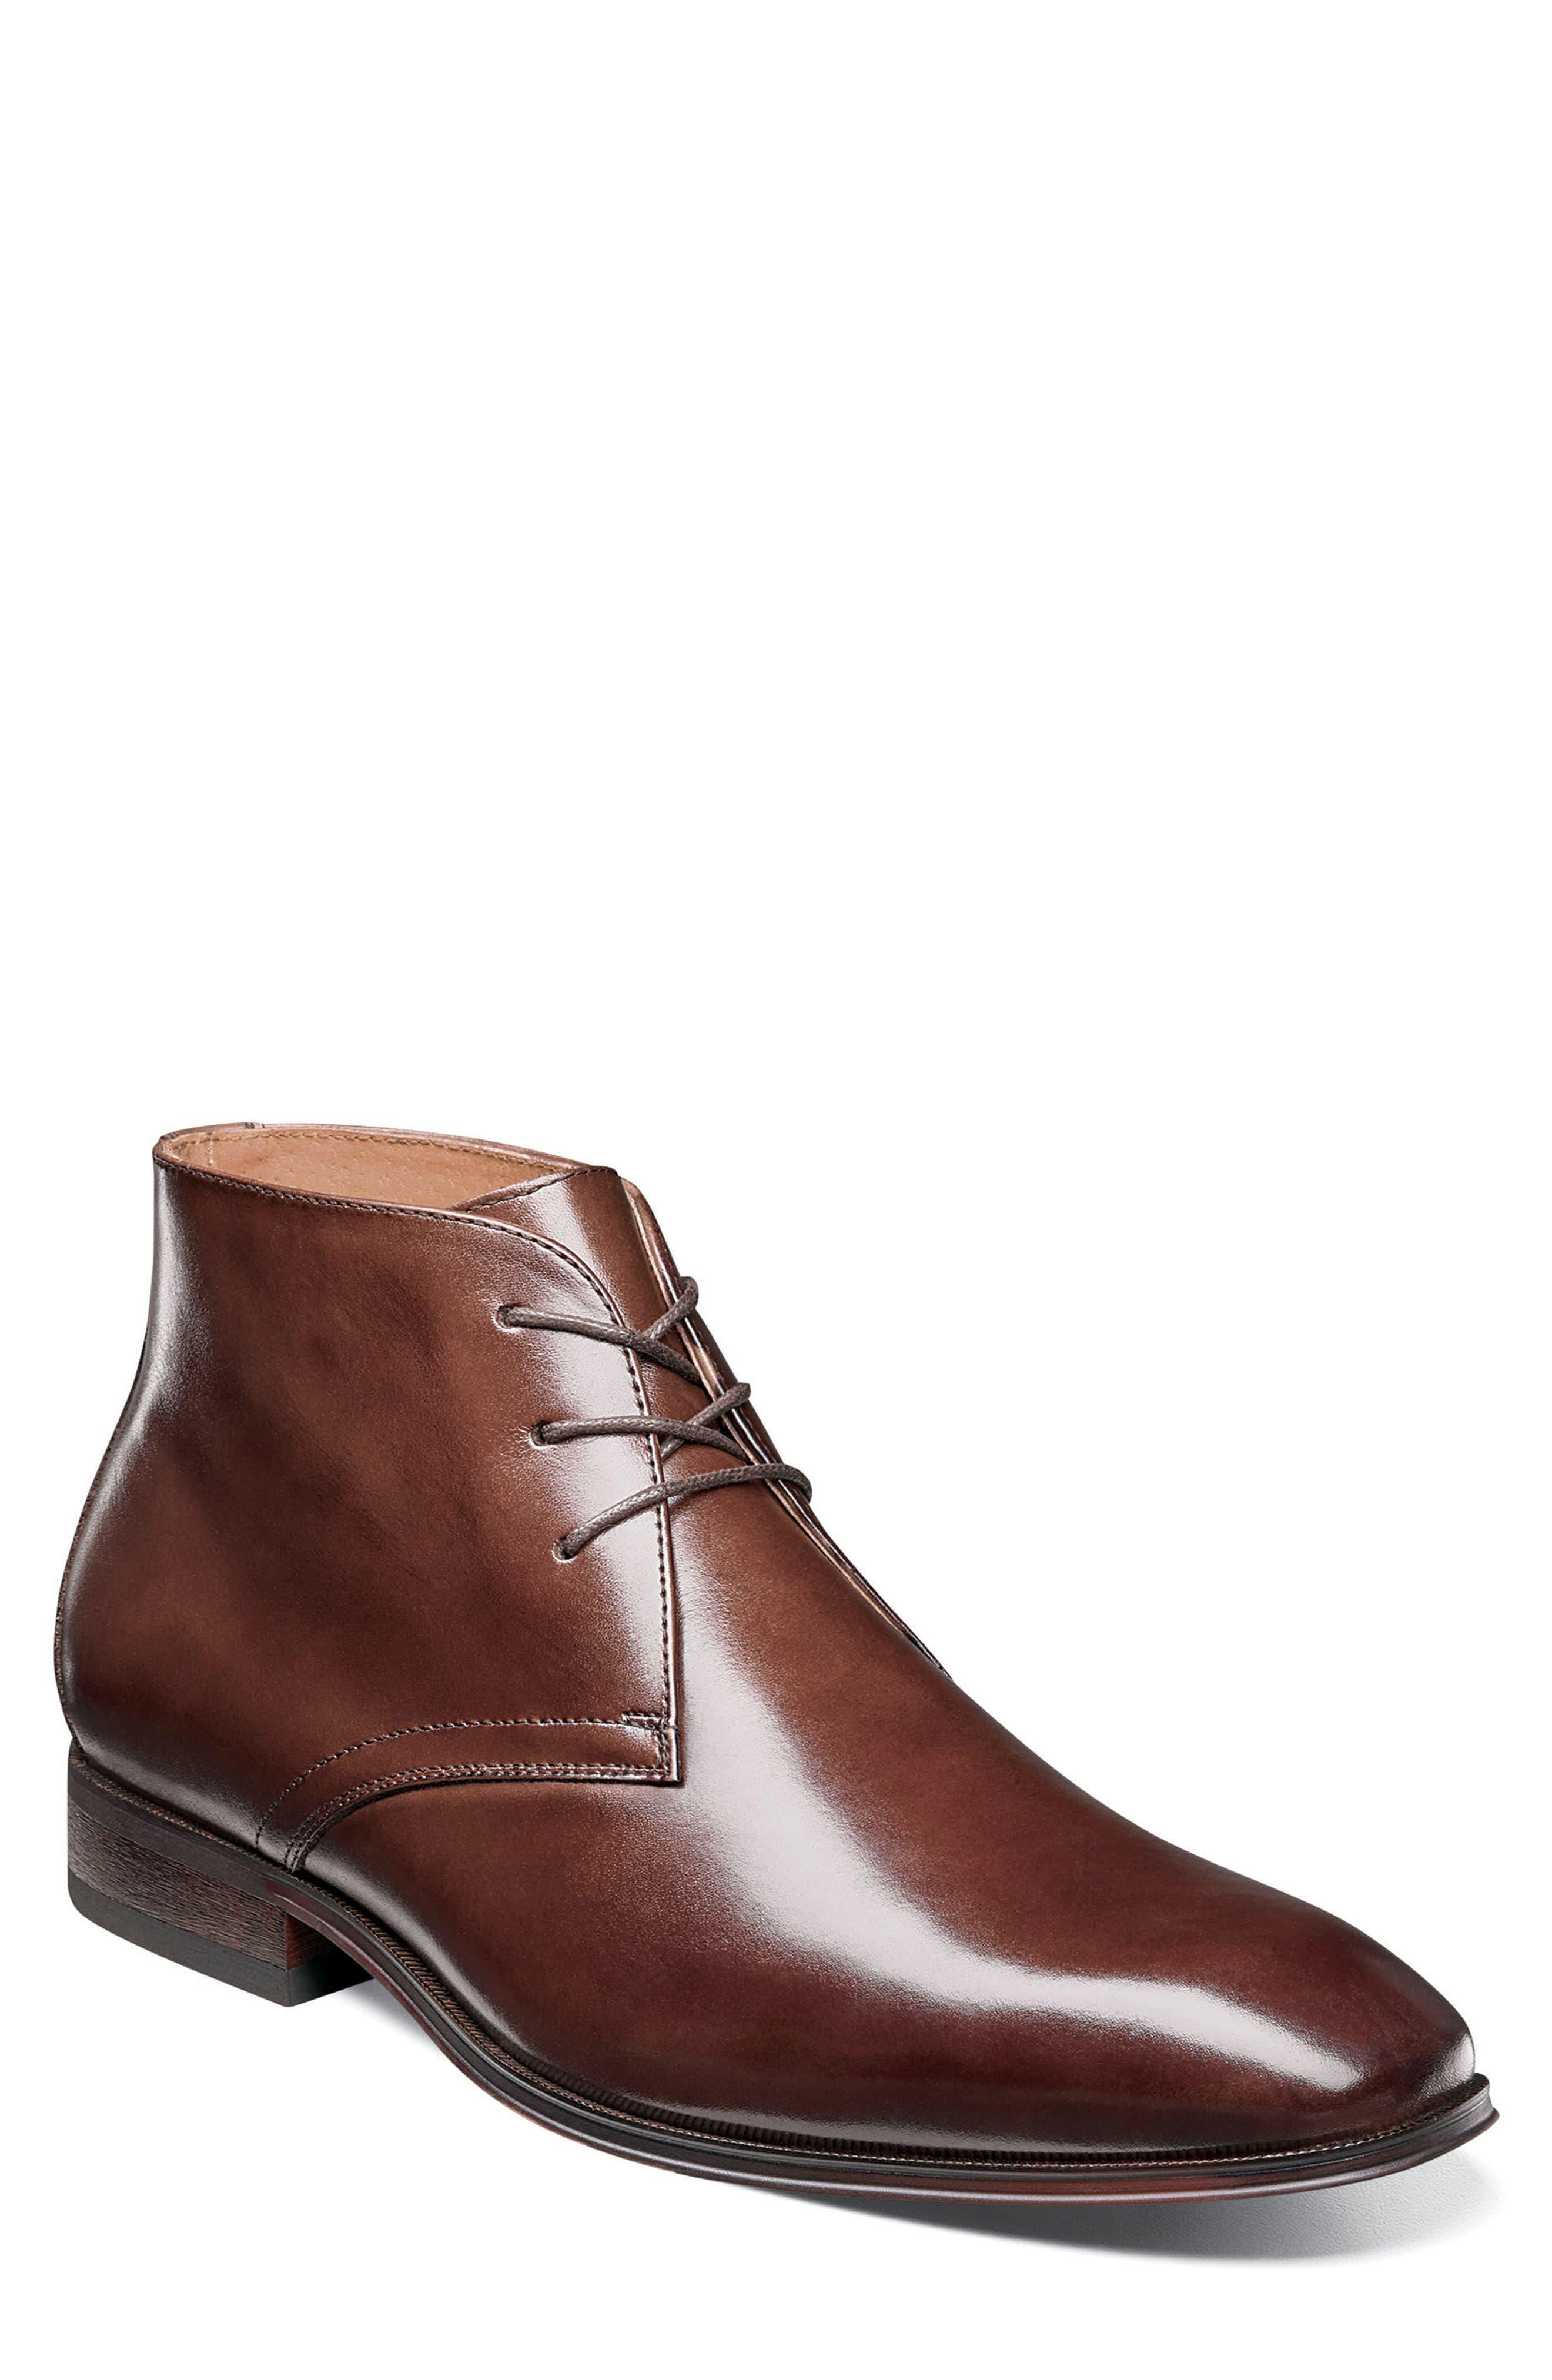 Corbetta Chukka Boot,                         Main,                         color, Cognac Leather